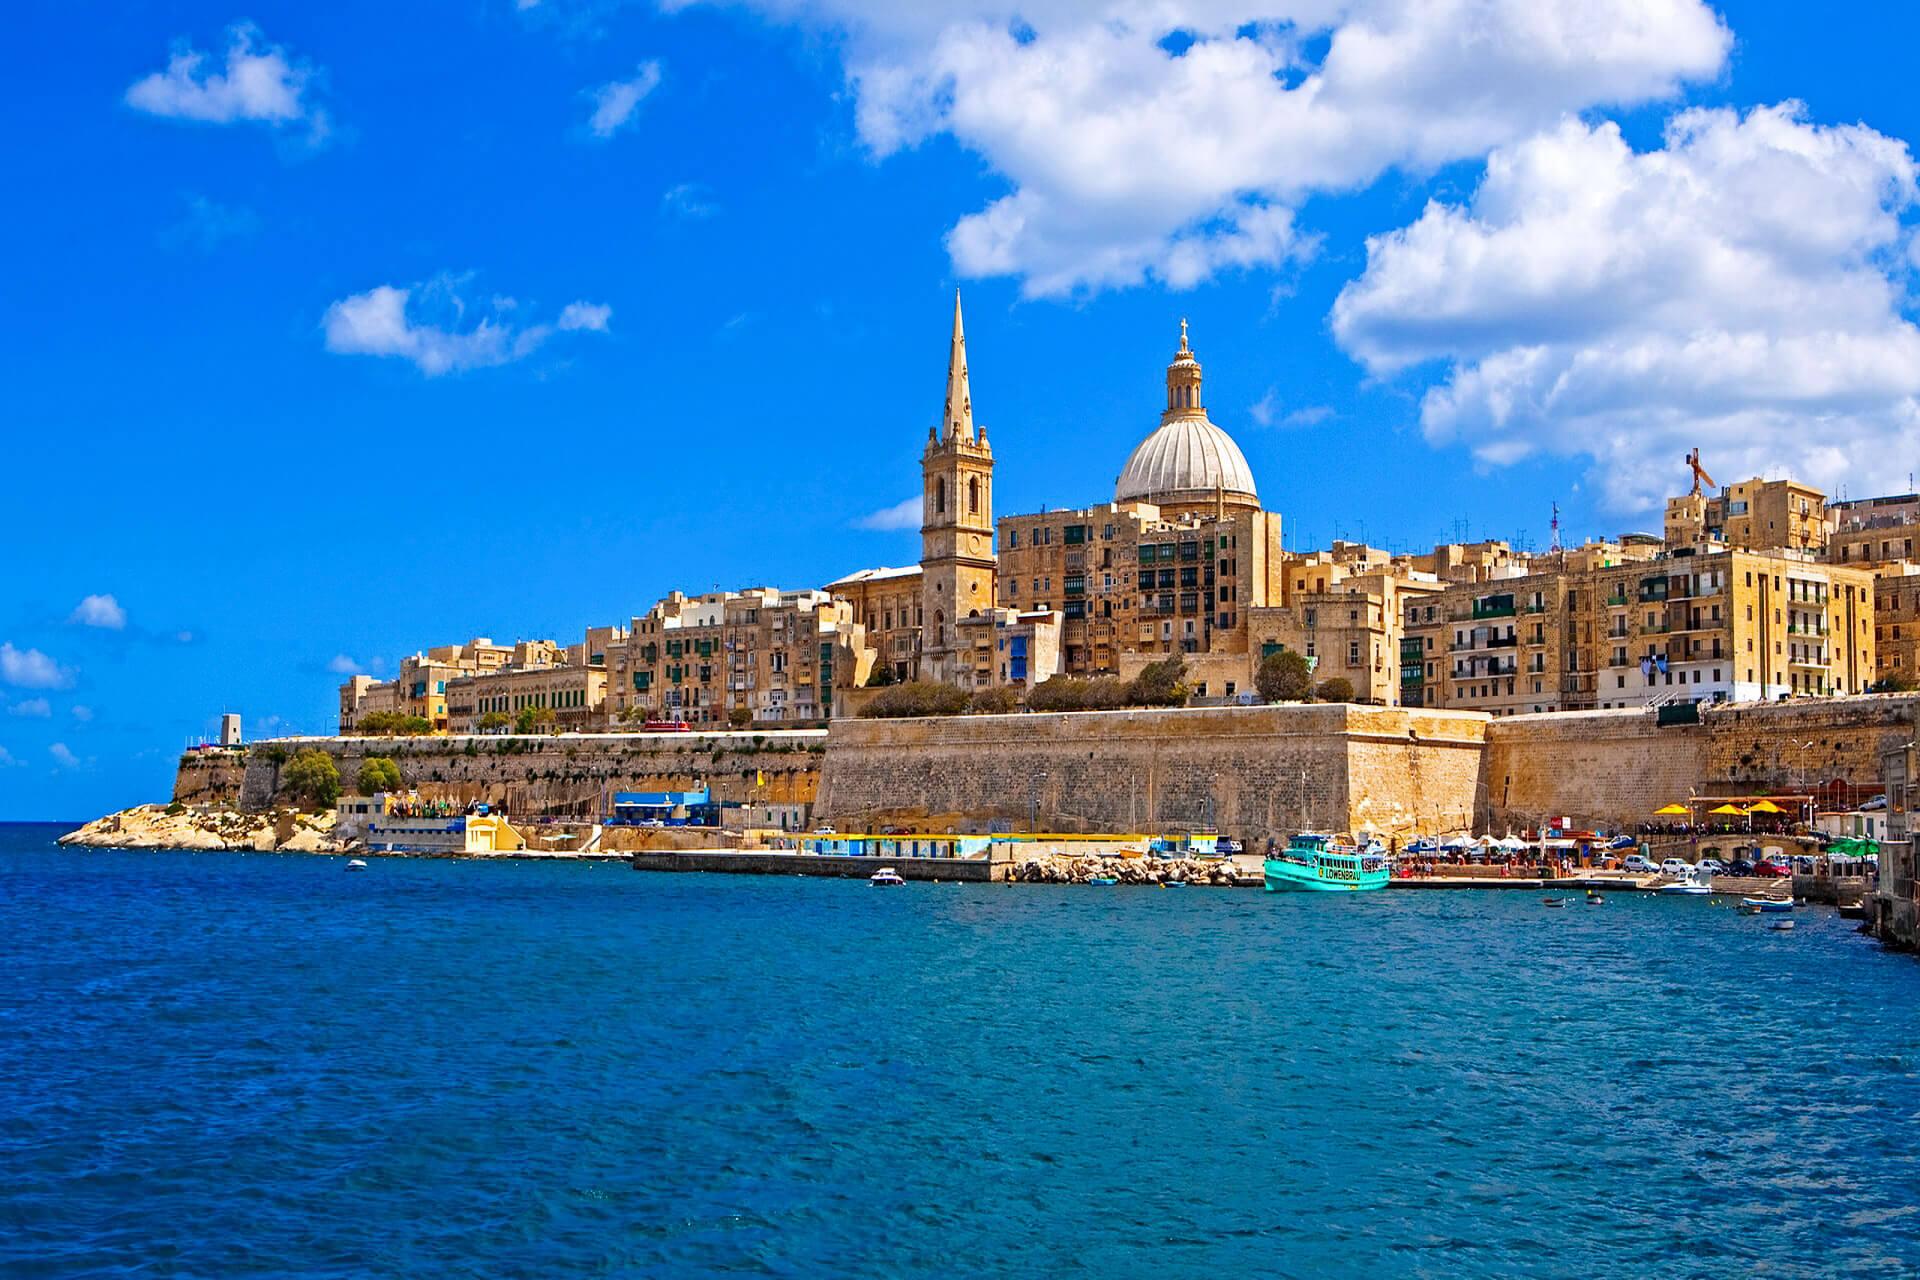 MALTA – ISLAND OF KNIGHTS, ARCHITECTURE AND CULTURE